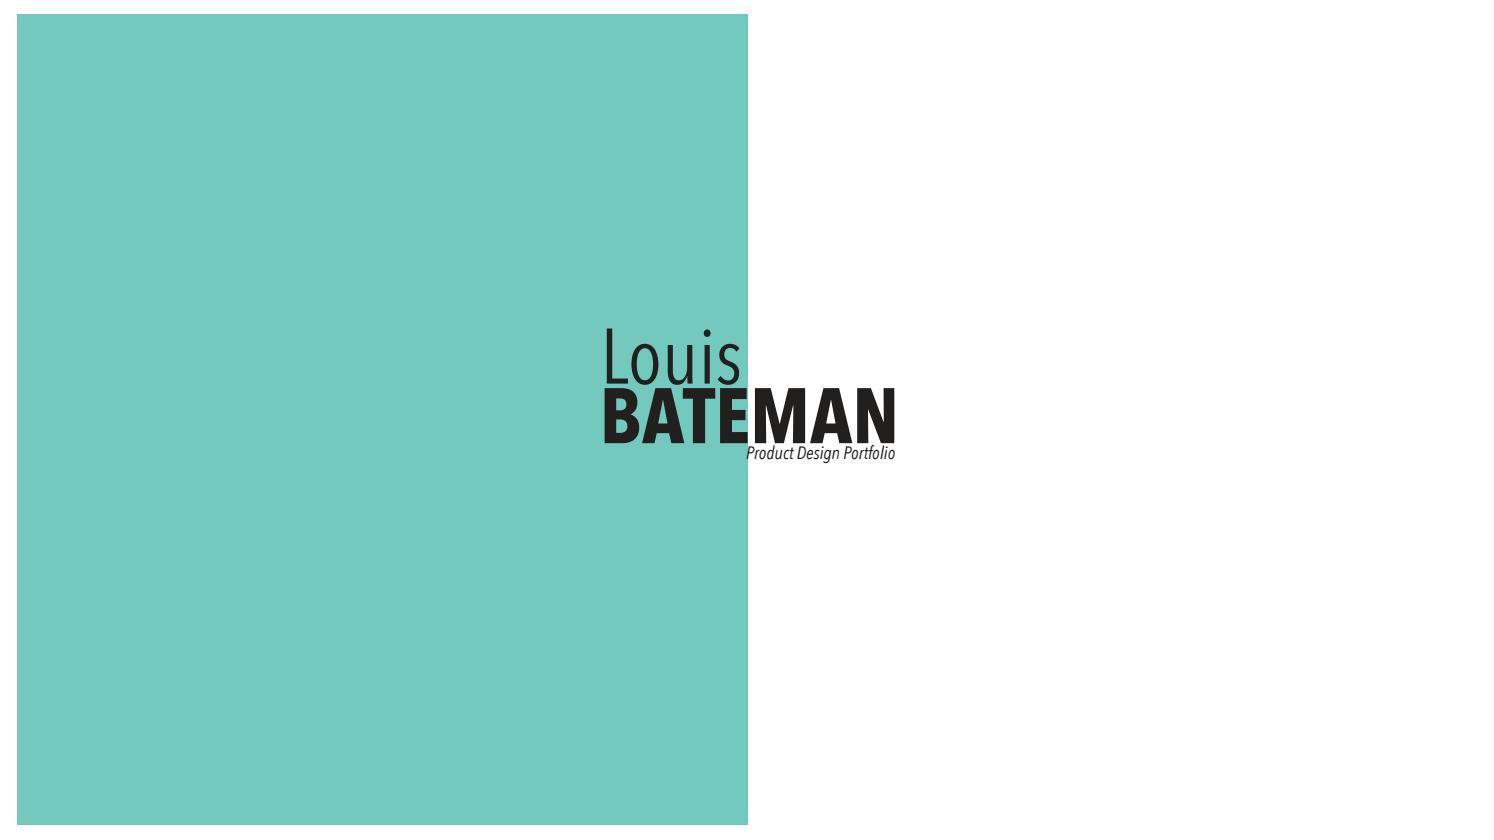 Louis Bateman Product Design Portfolio Loughborough Design School By Lb Des1gn Issuu